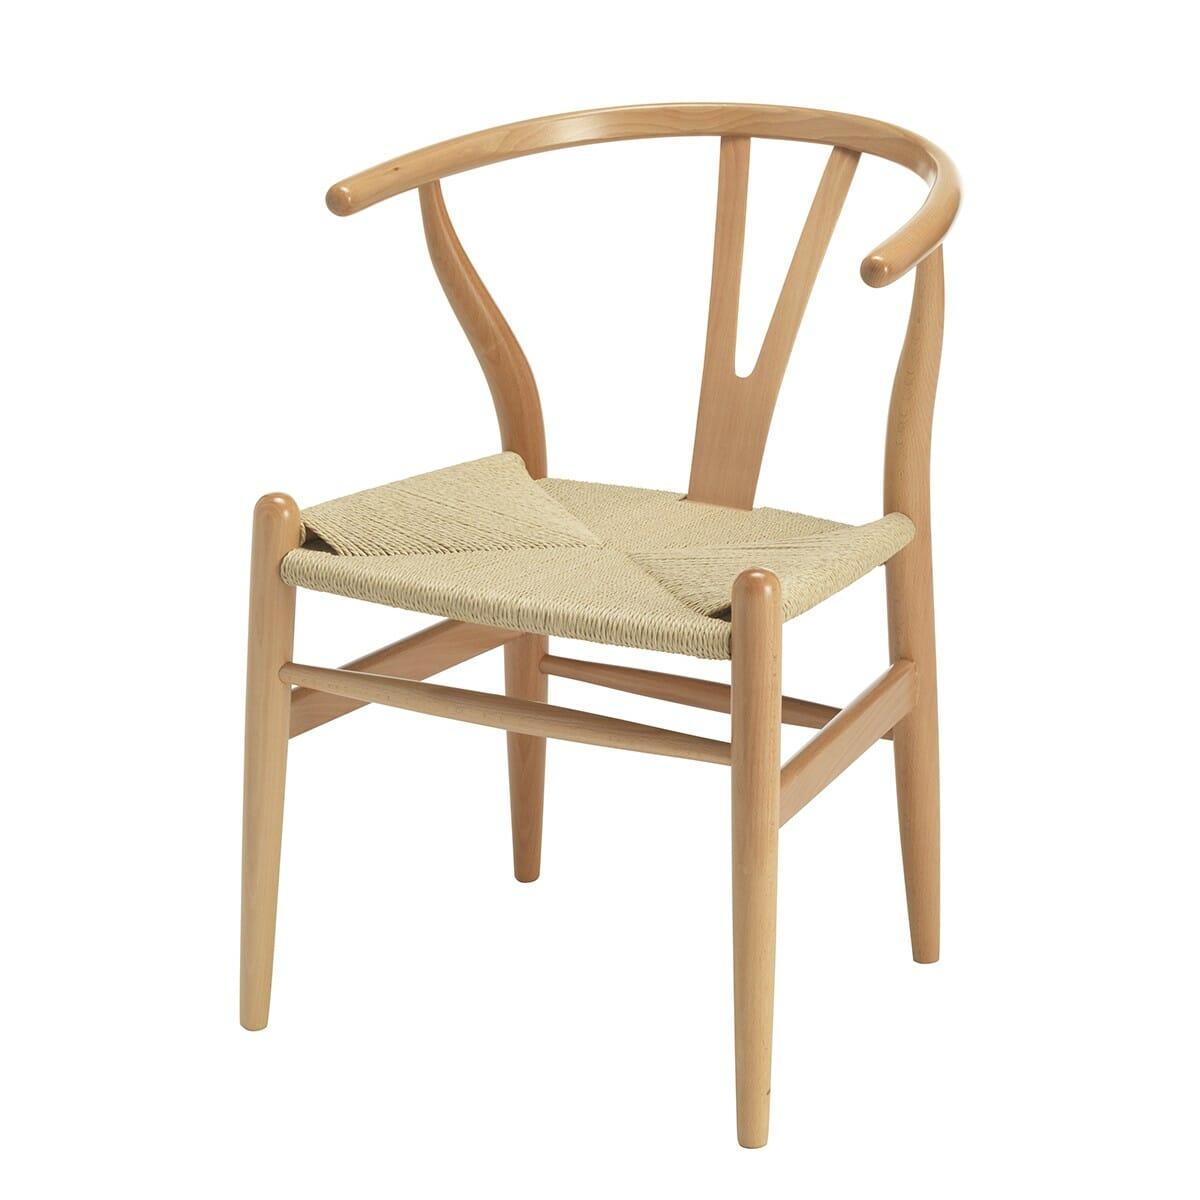 wishbone chairs la z boy office chair uk for sale nz hans j wegner carl hansen san